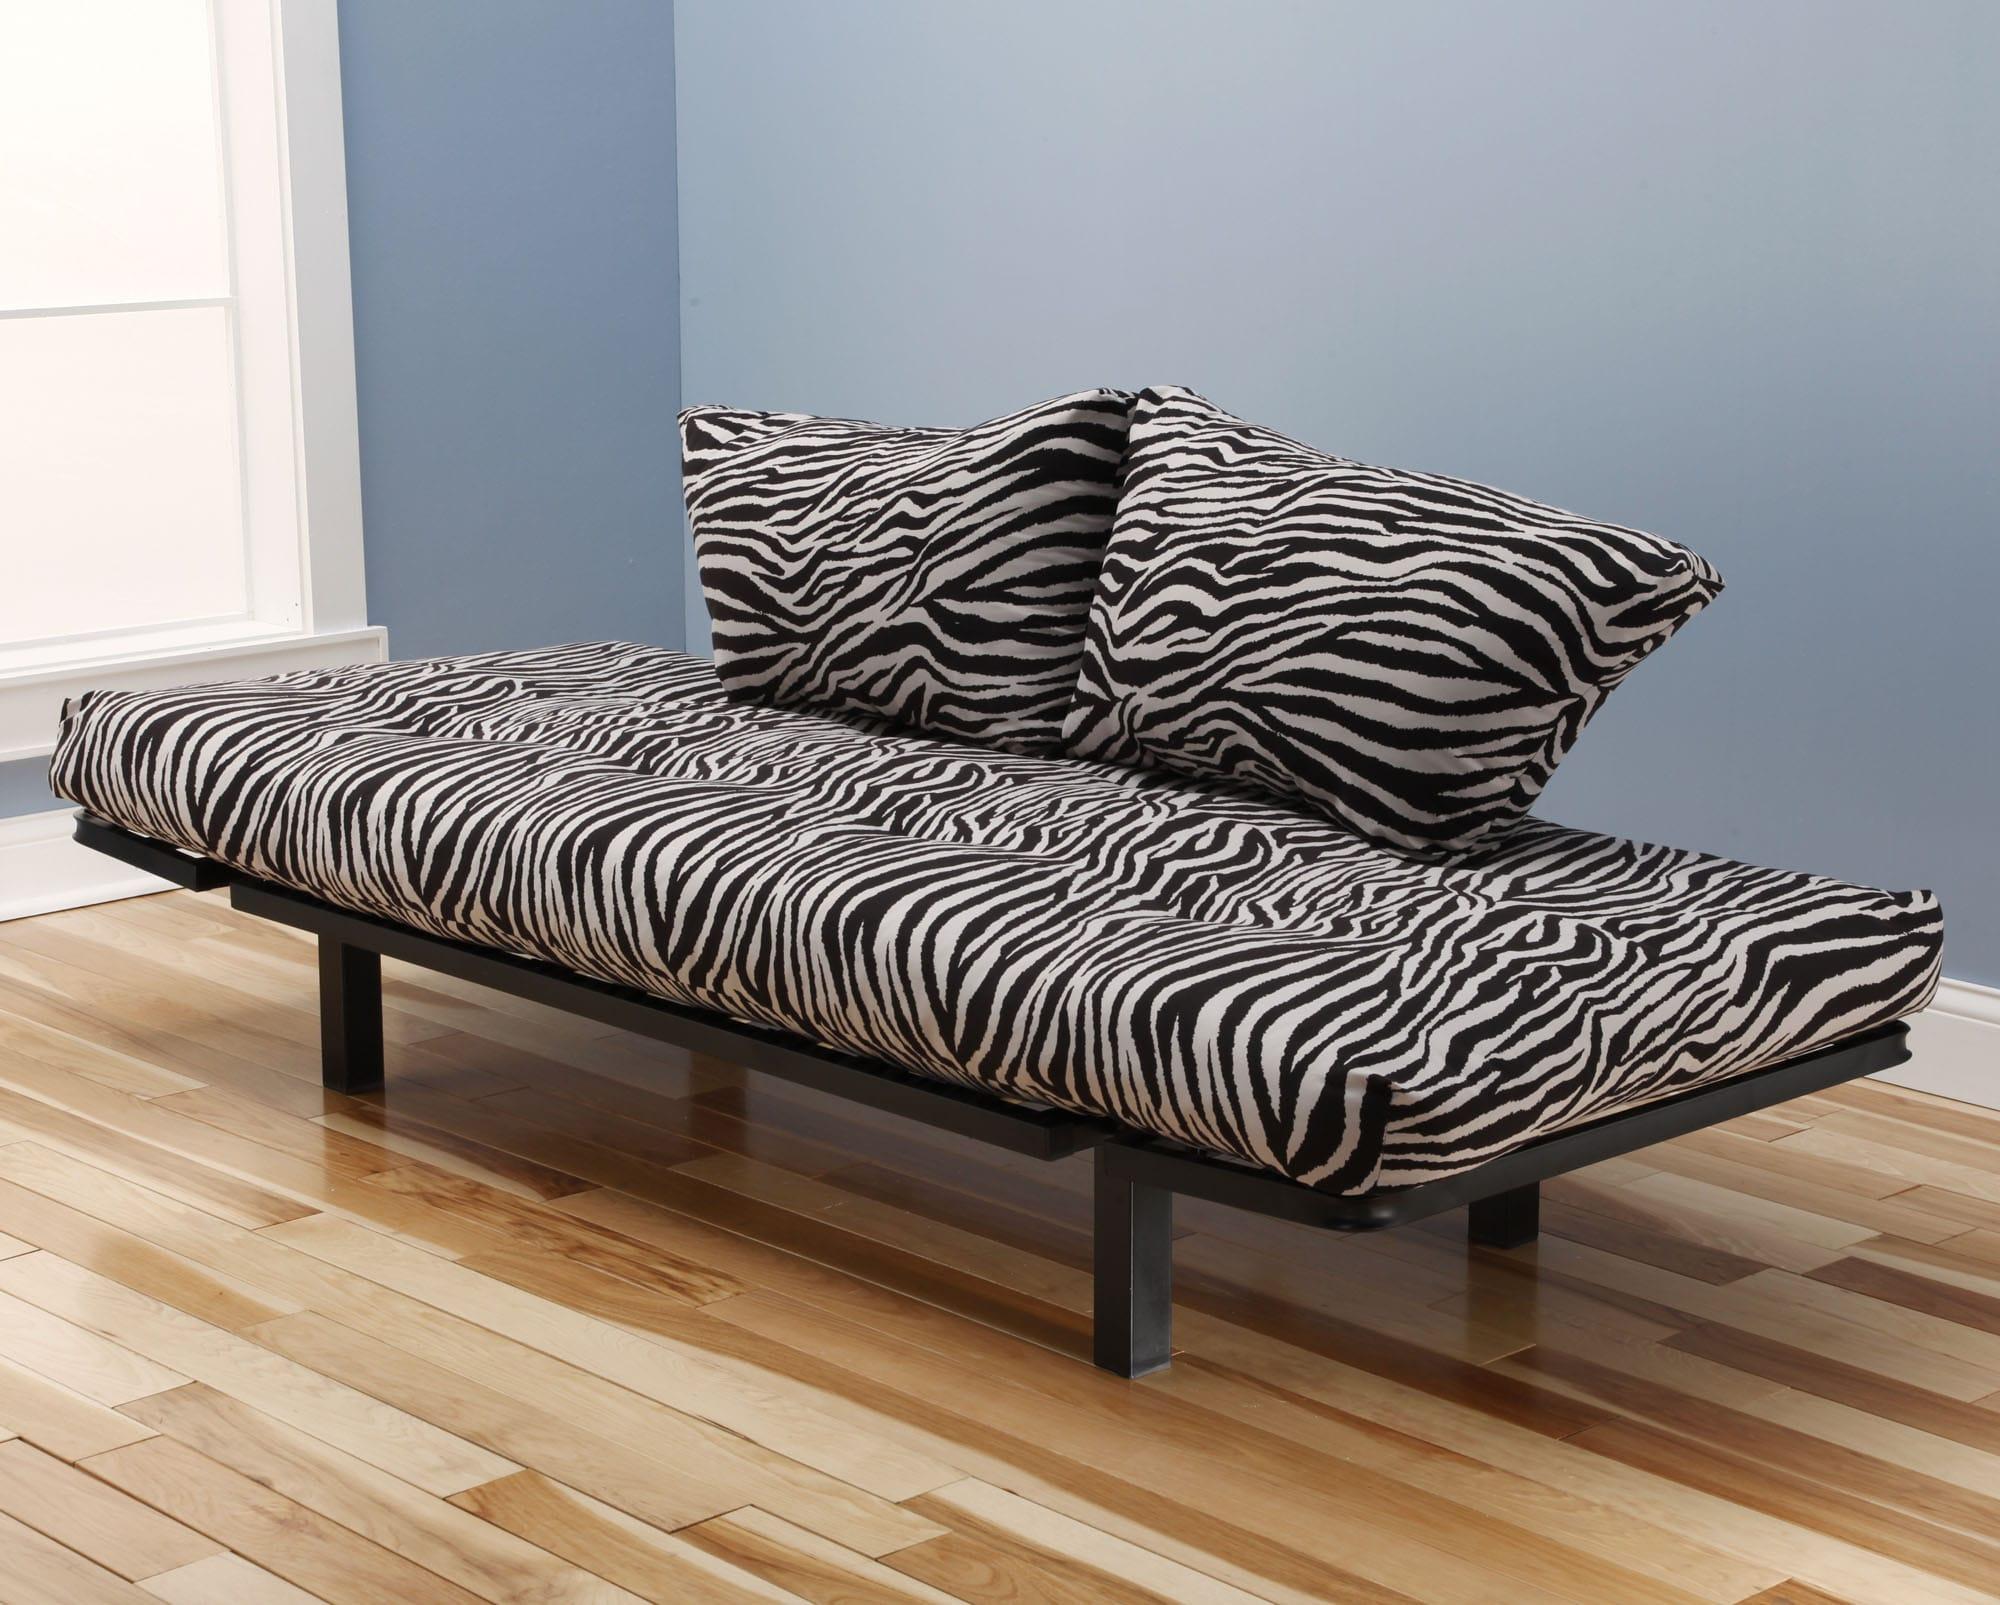 Spacely Futon Daybed Lounger With Mattress Zebra Zen By Kodiak